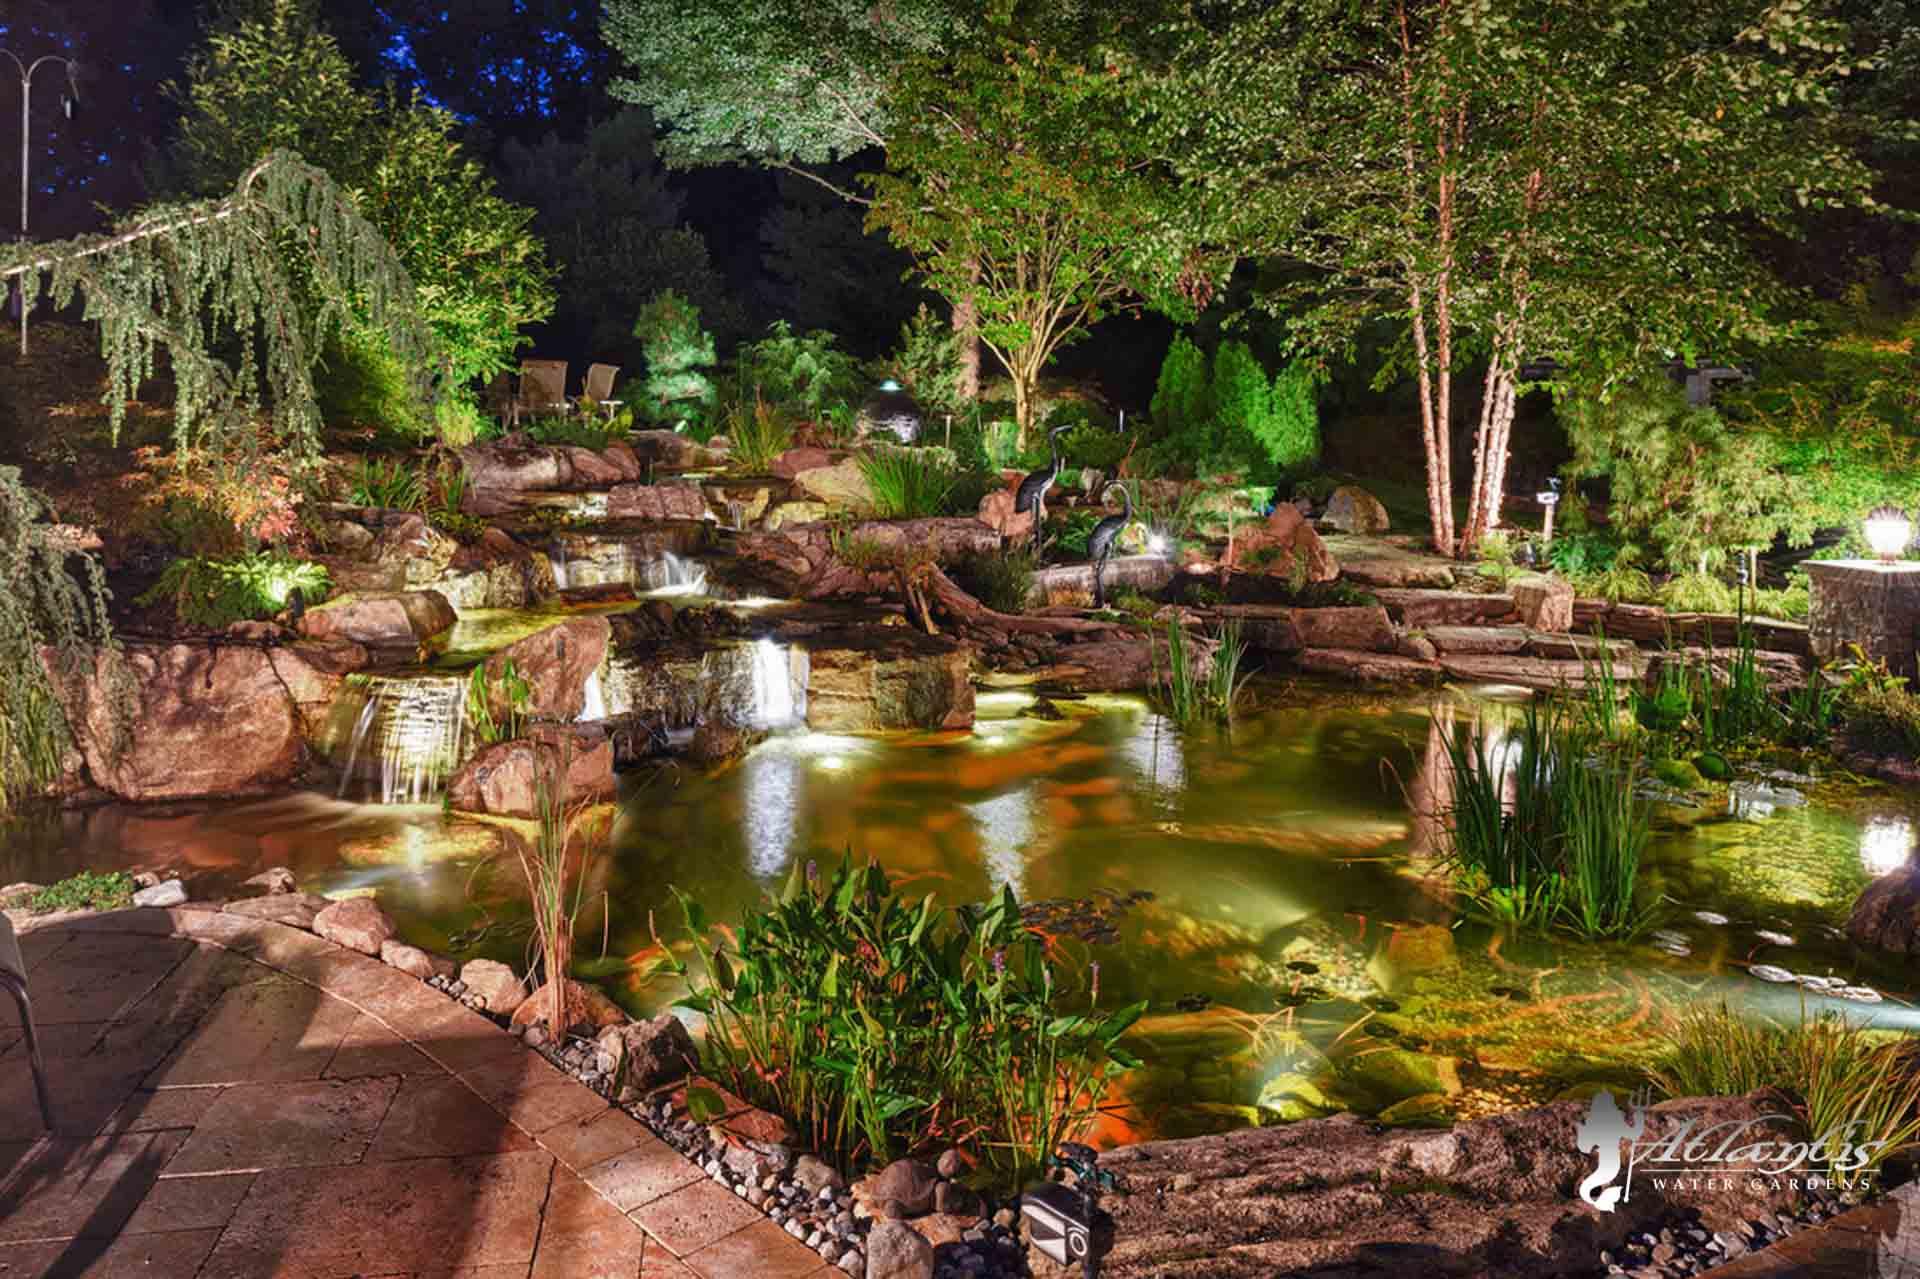 Koi Ponds by Atlantis Water Gardens - Denville NJ